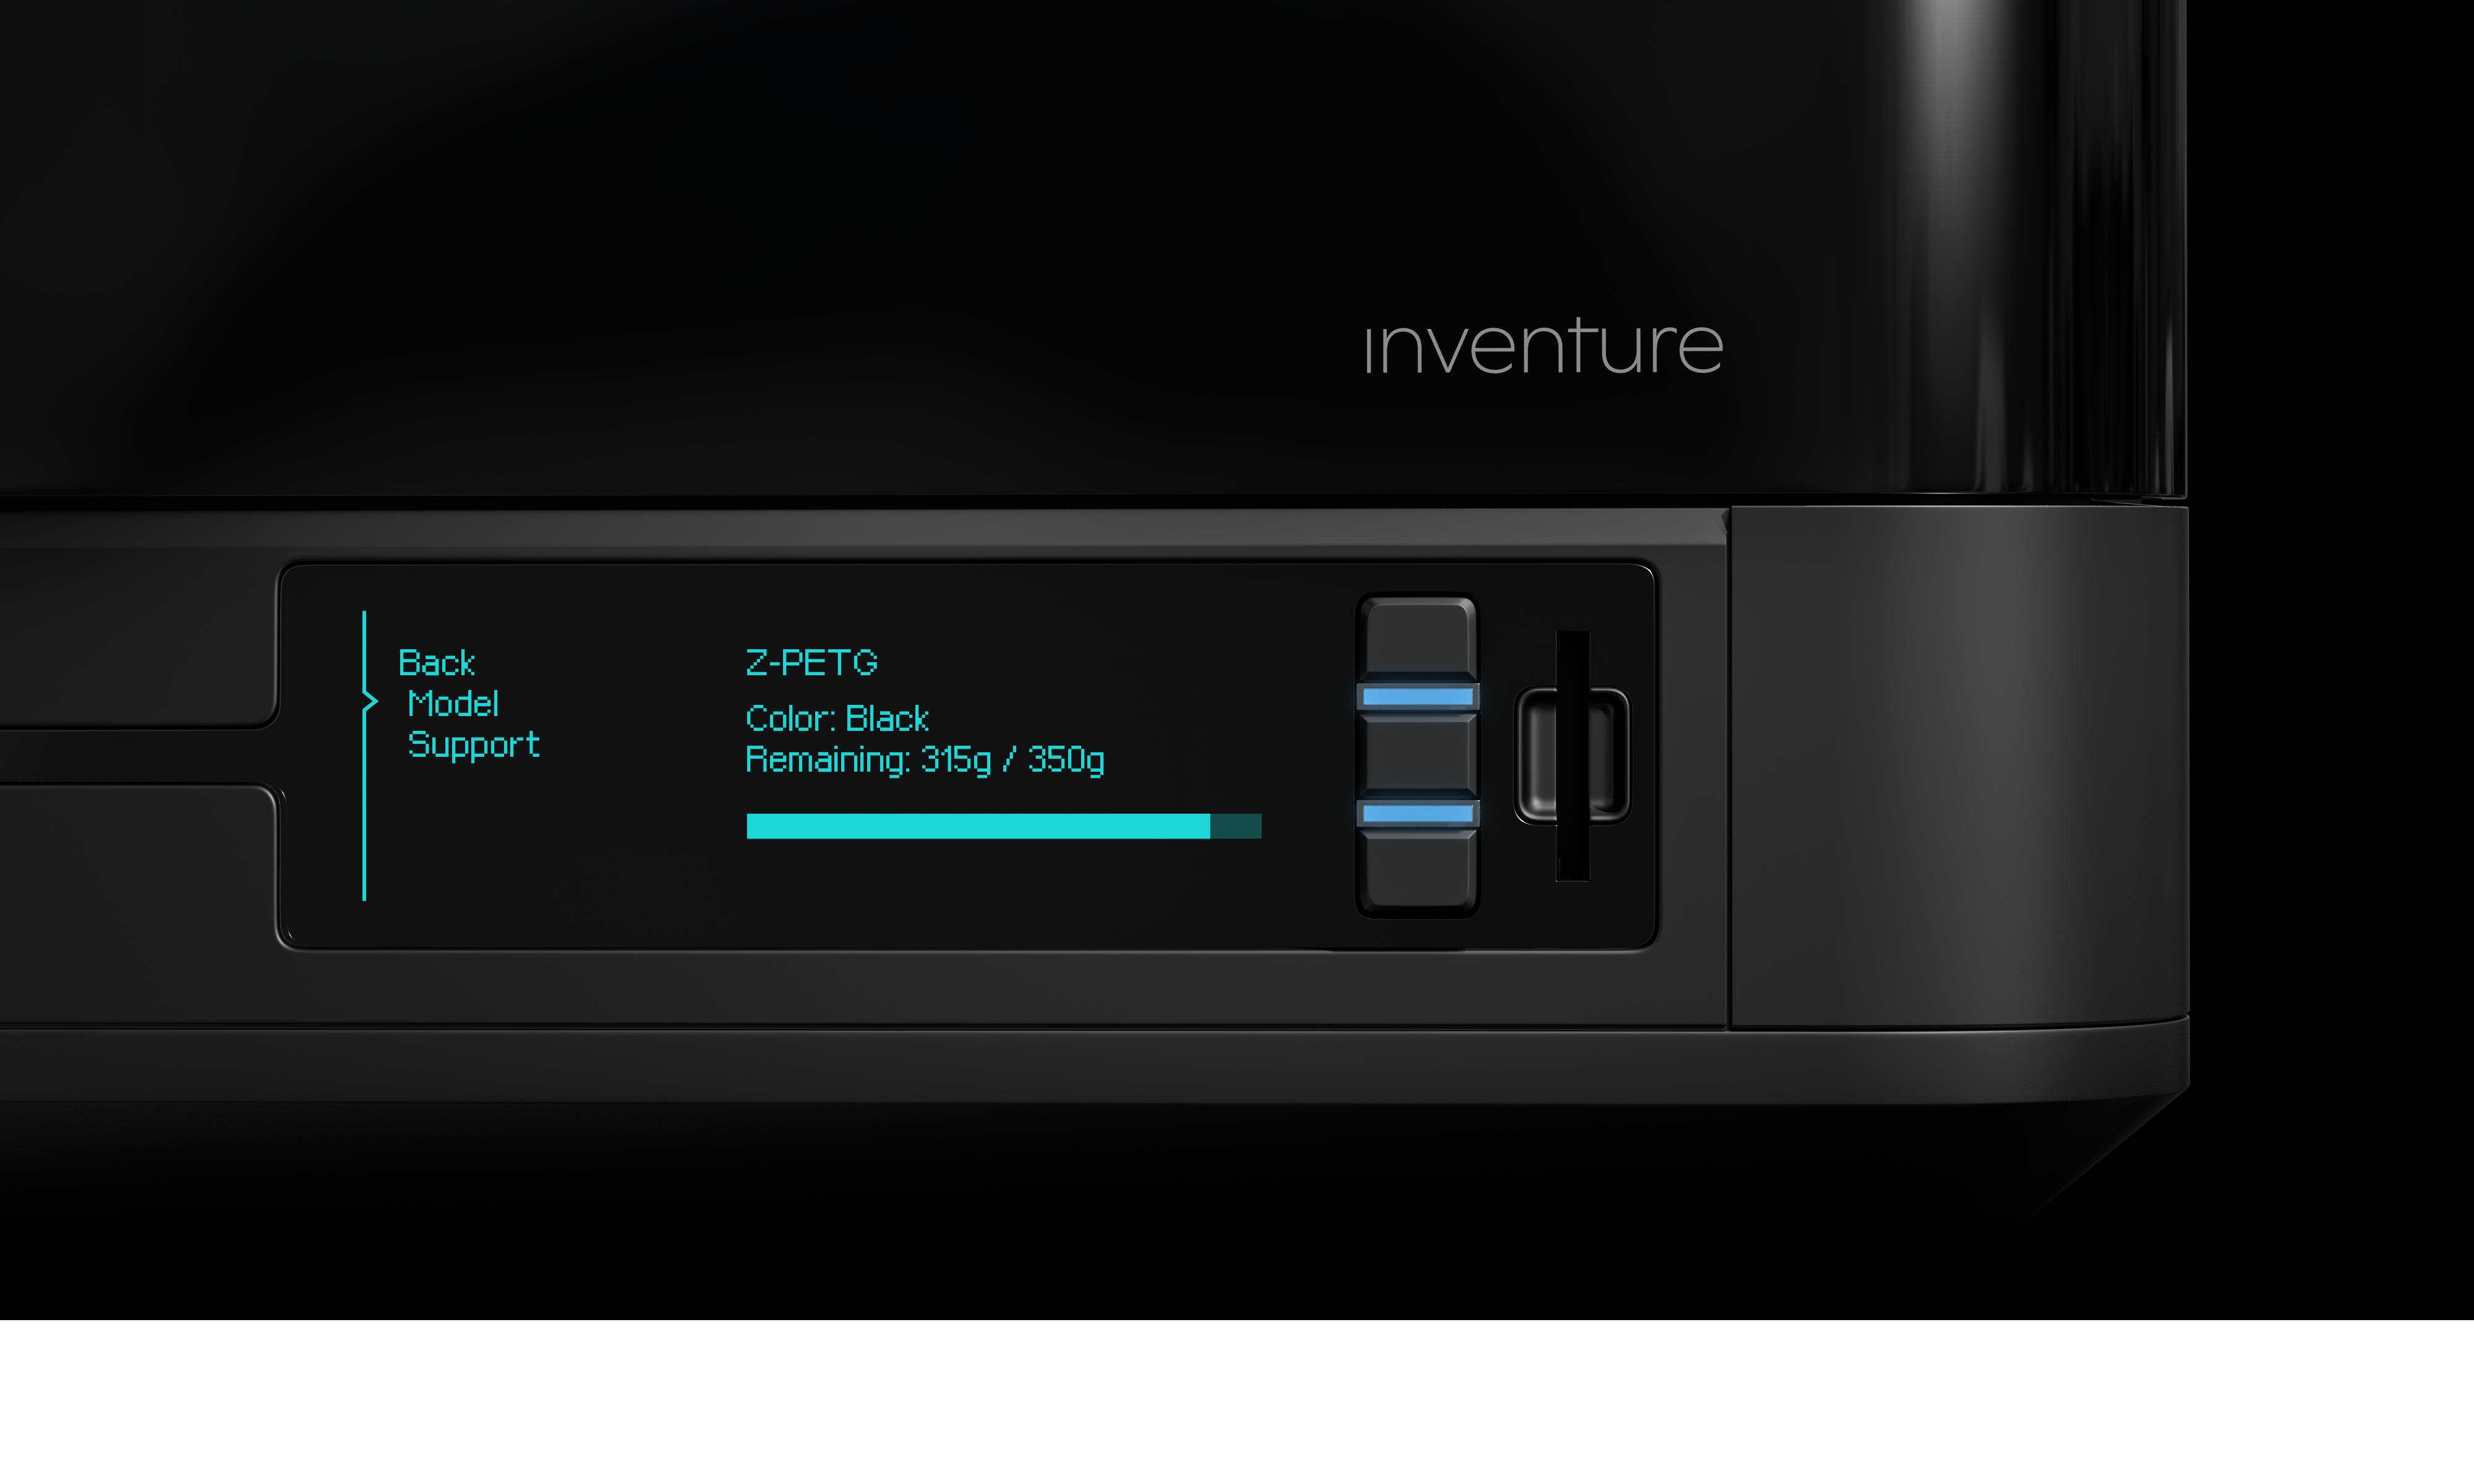 Inventure_detail